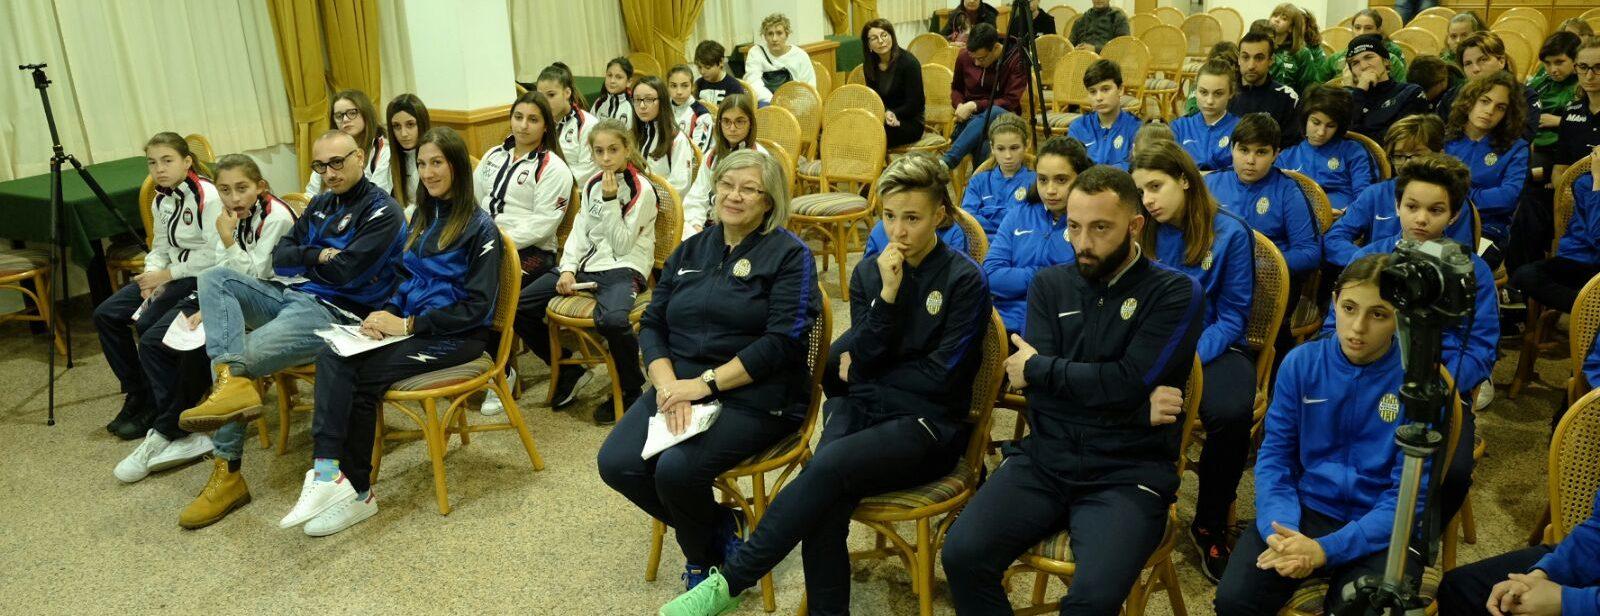 al-via-il-trofeo-caroli-hotels-under-13-femminile